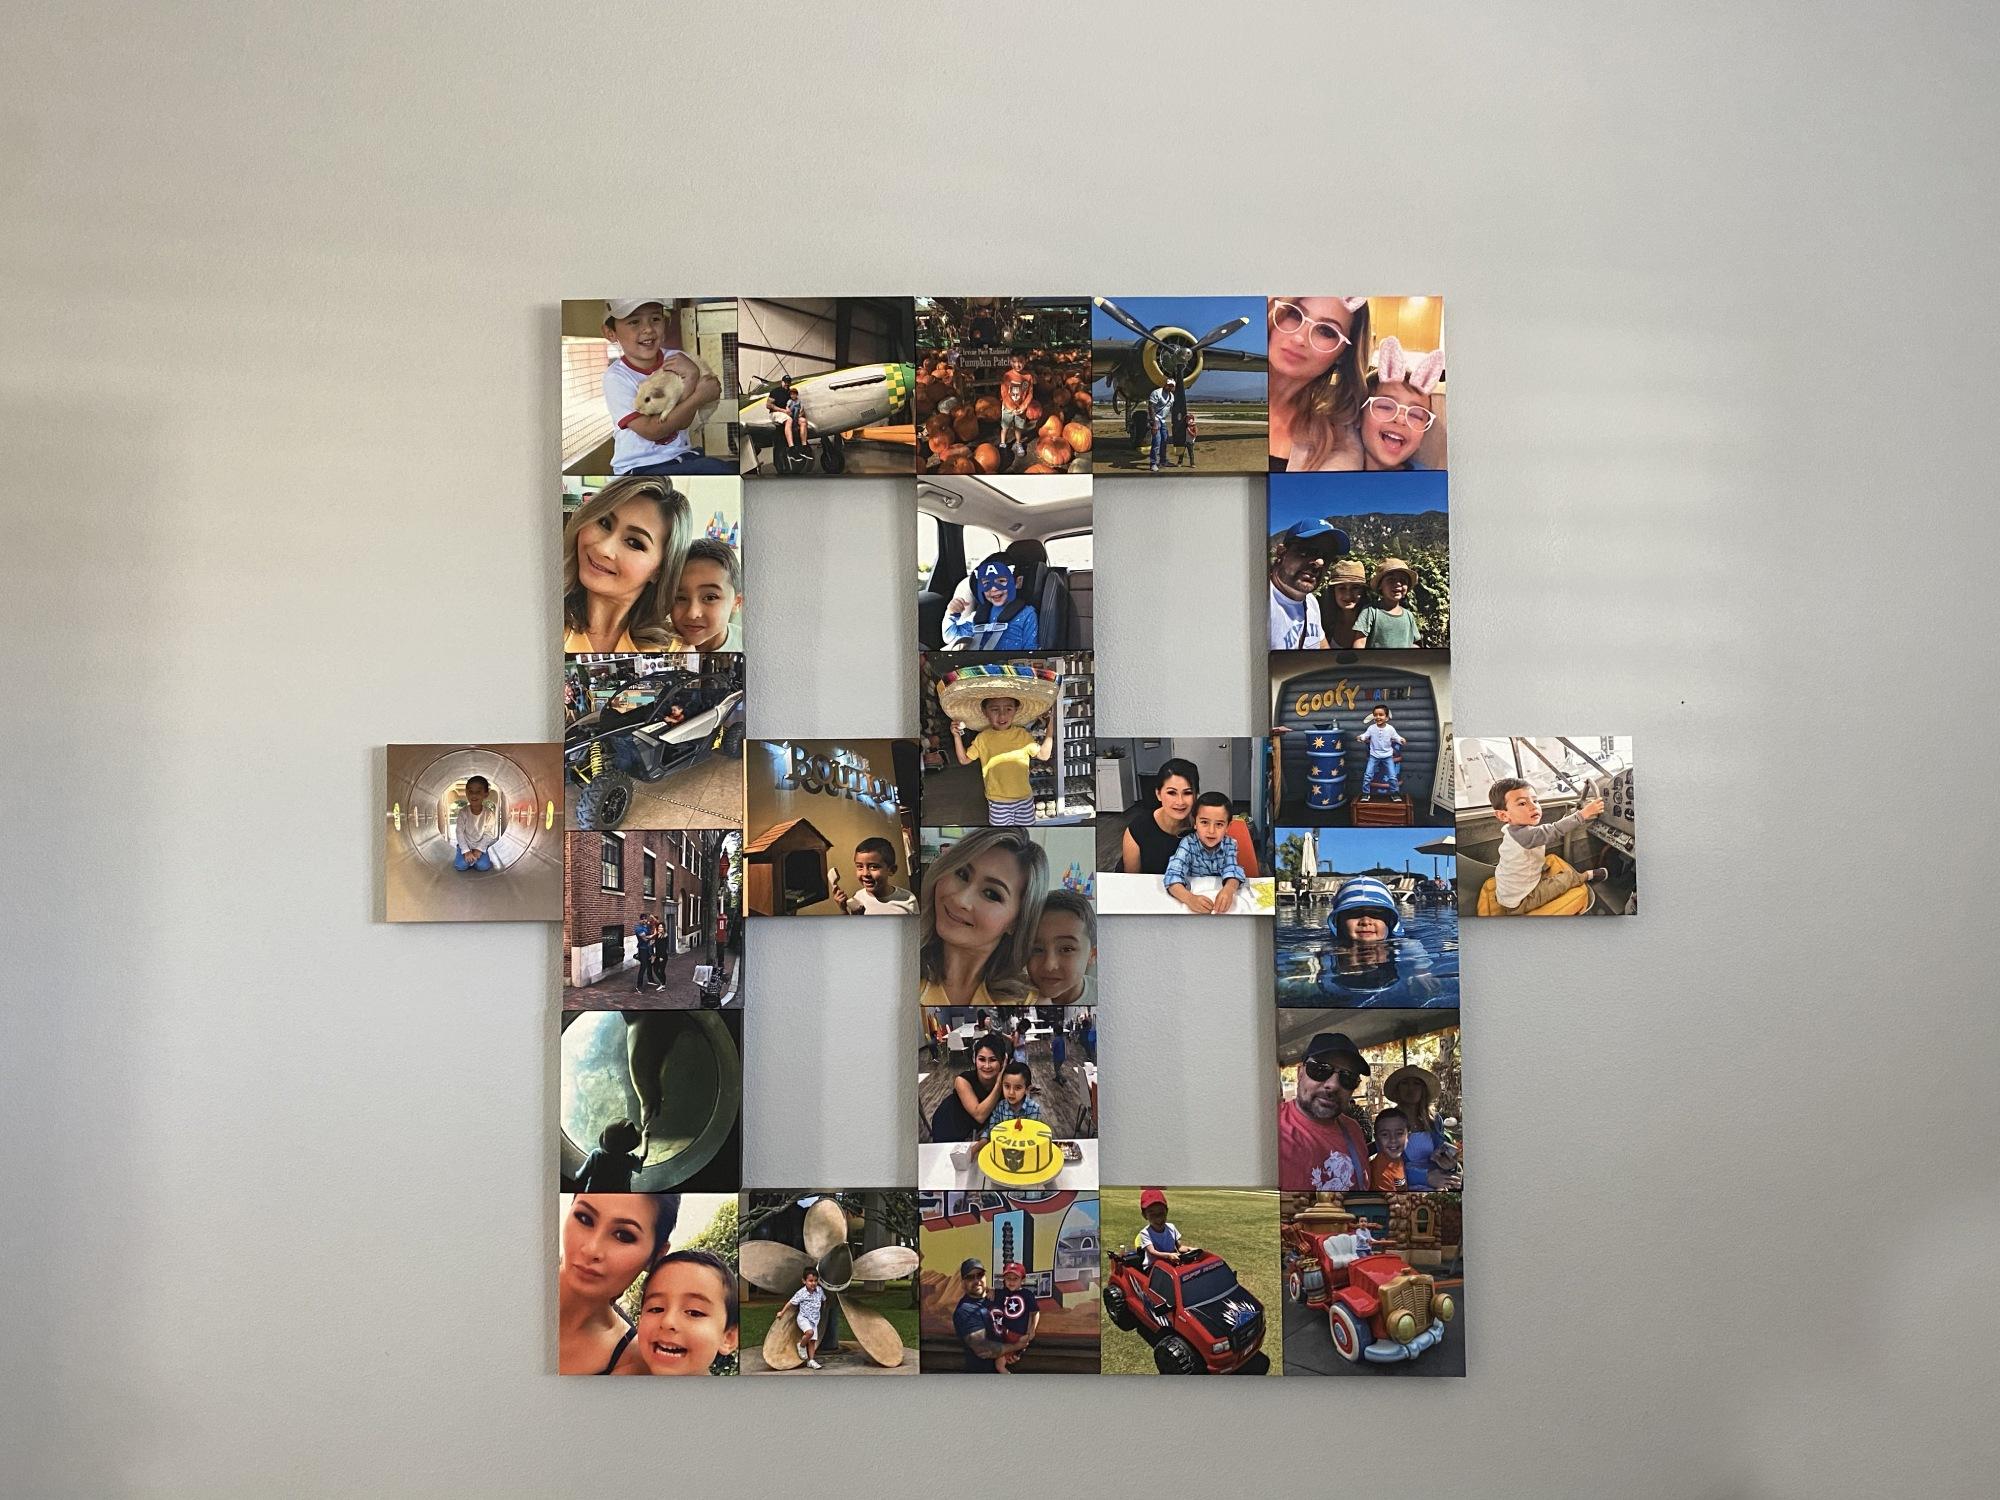 snaptiles photo tiles review image